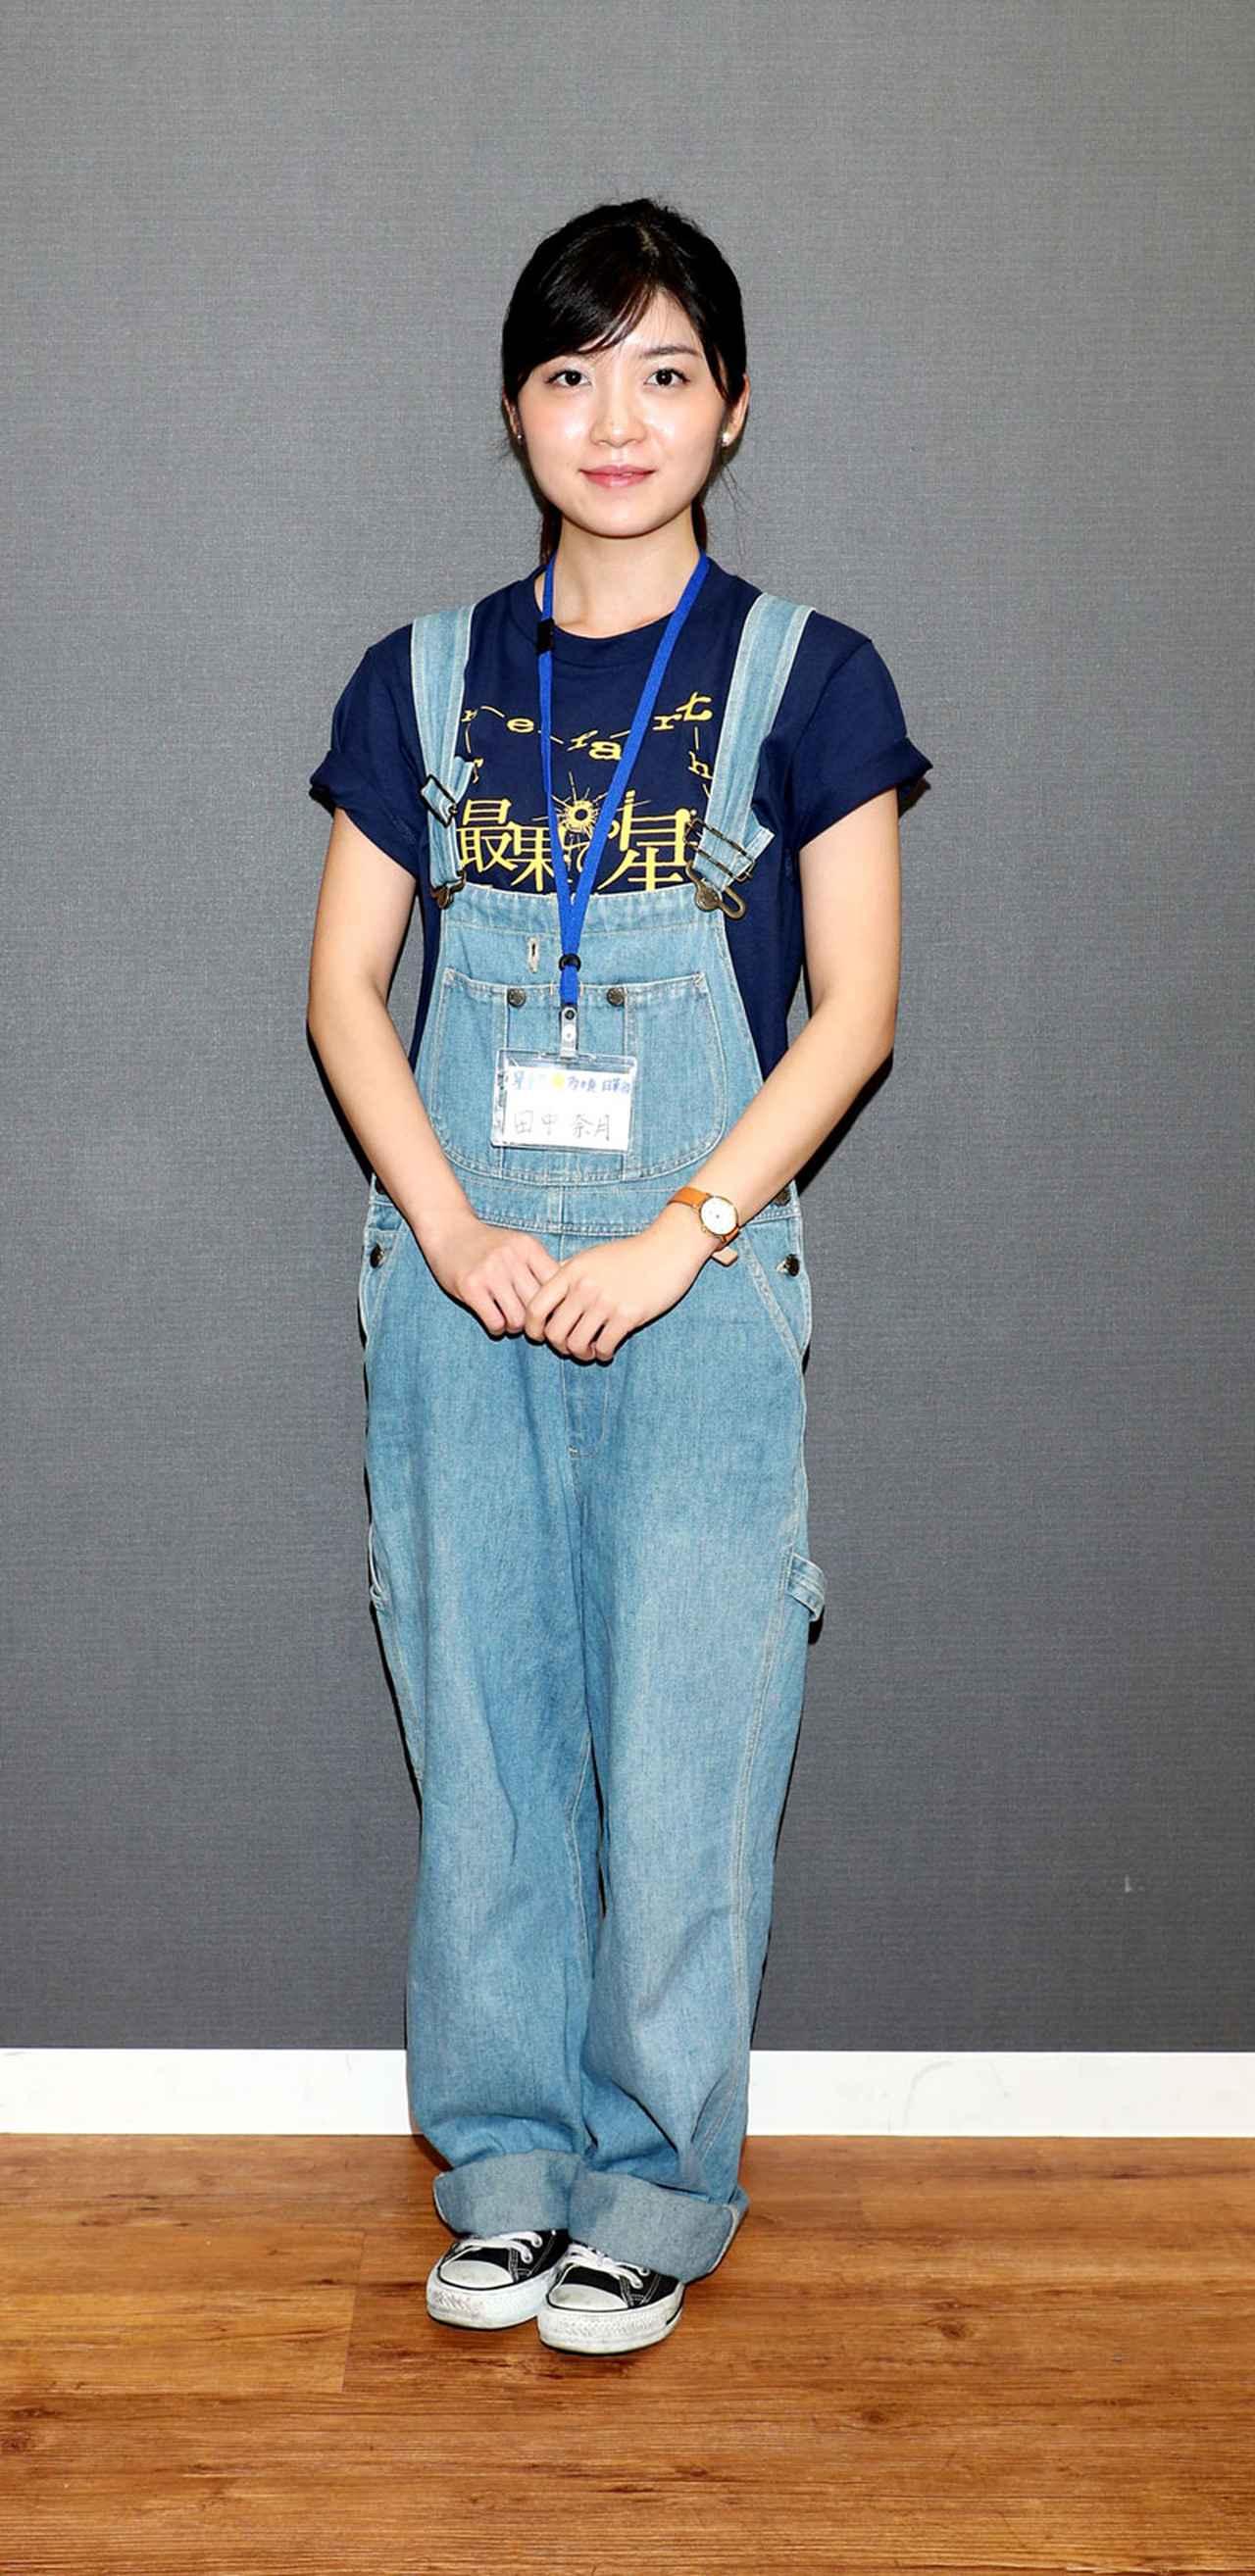 Images : 2番目の画像 - 「田中奈月/将来有望な若手女優の中でも大注目の一人が、アリスインプロジェクト最新作で印象に残る役を熱演!」のアルバム - Stereo Sound ONLINE